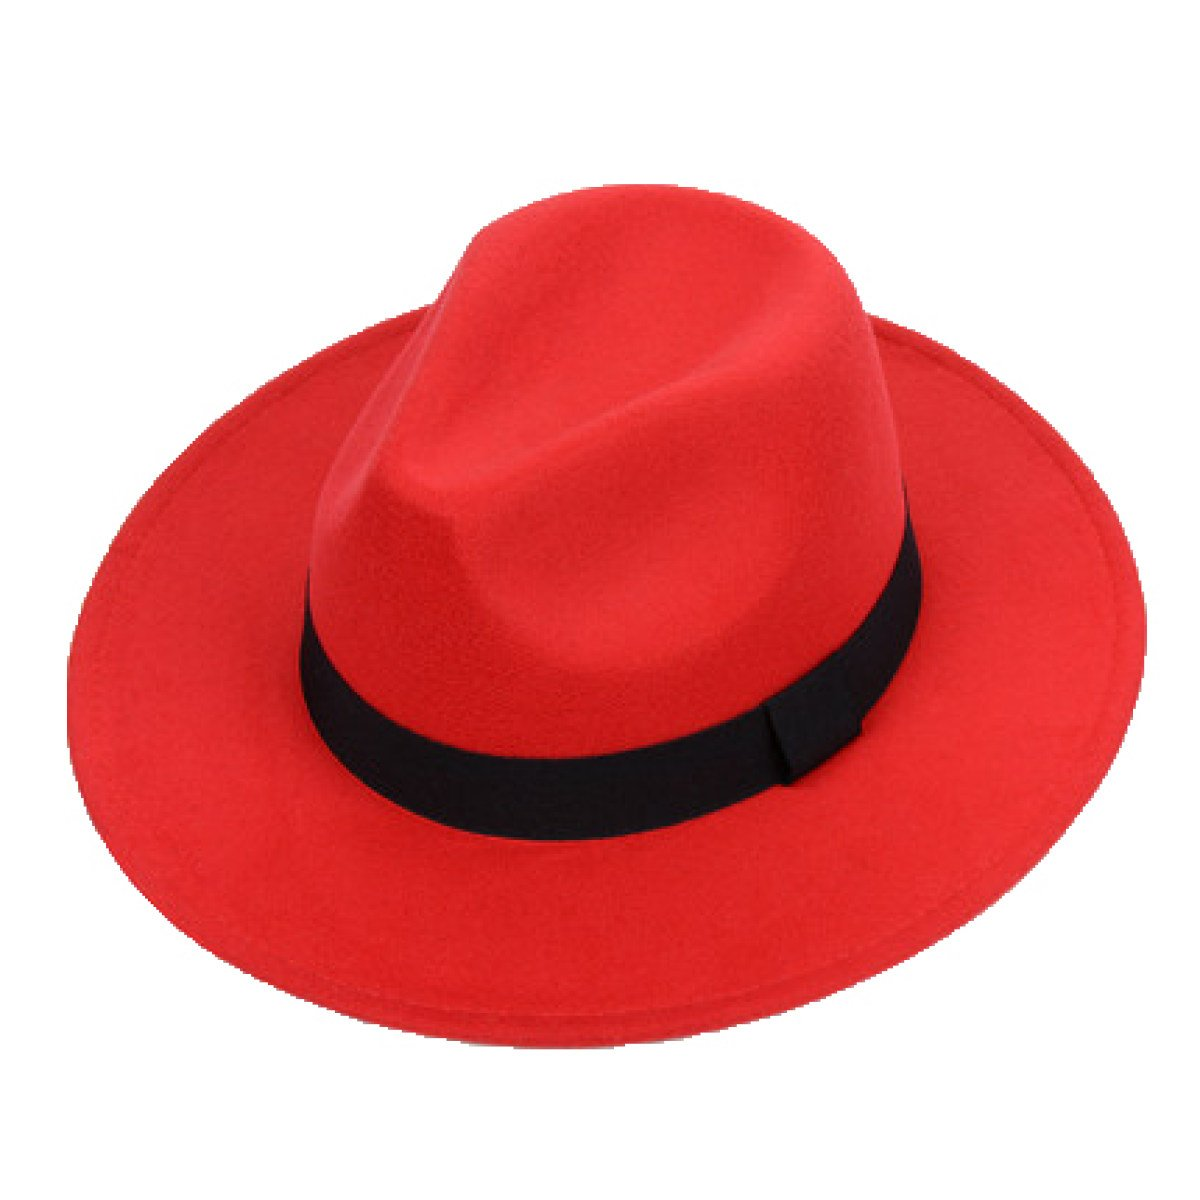 Hat Man And Woman Retro Hat New Hat Tide Gentleman Big Eaves Wide Canopy Hat Black-OneSize SJDT